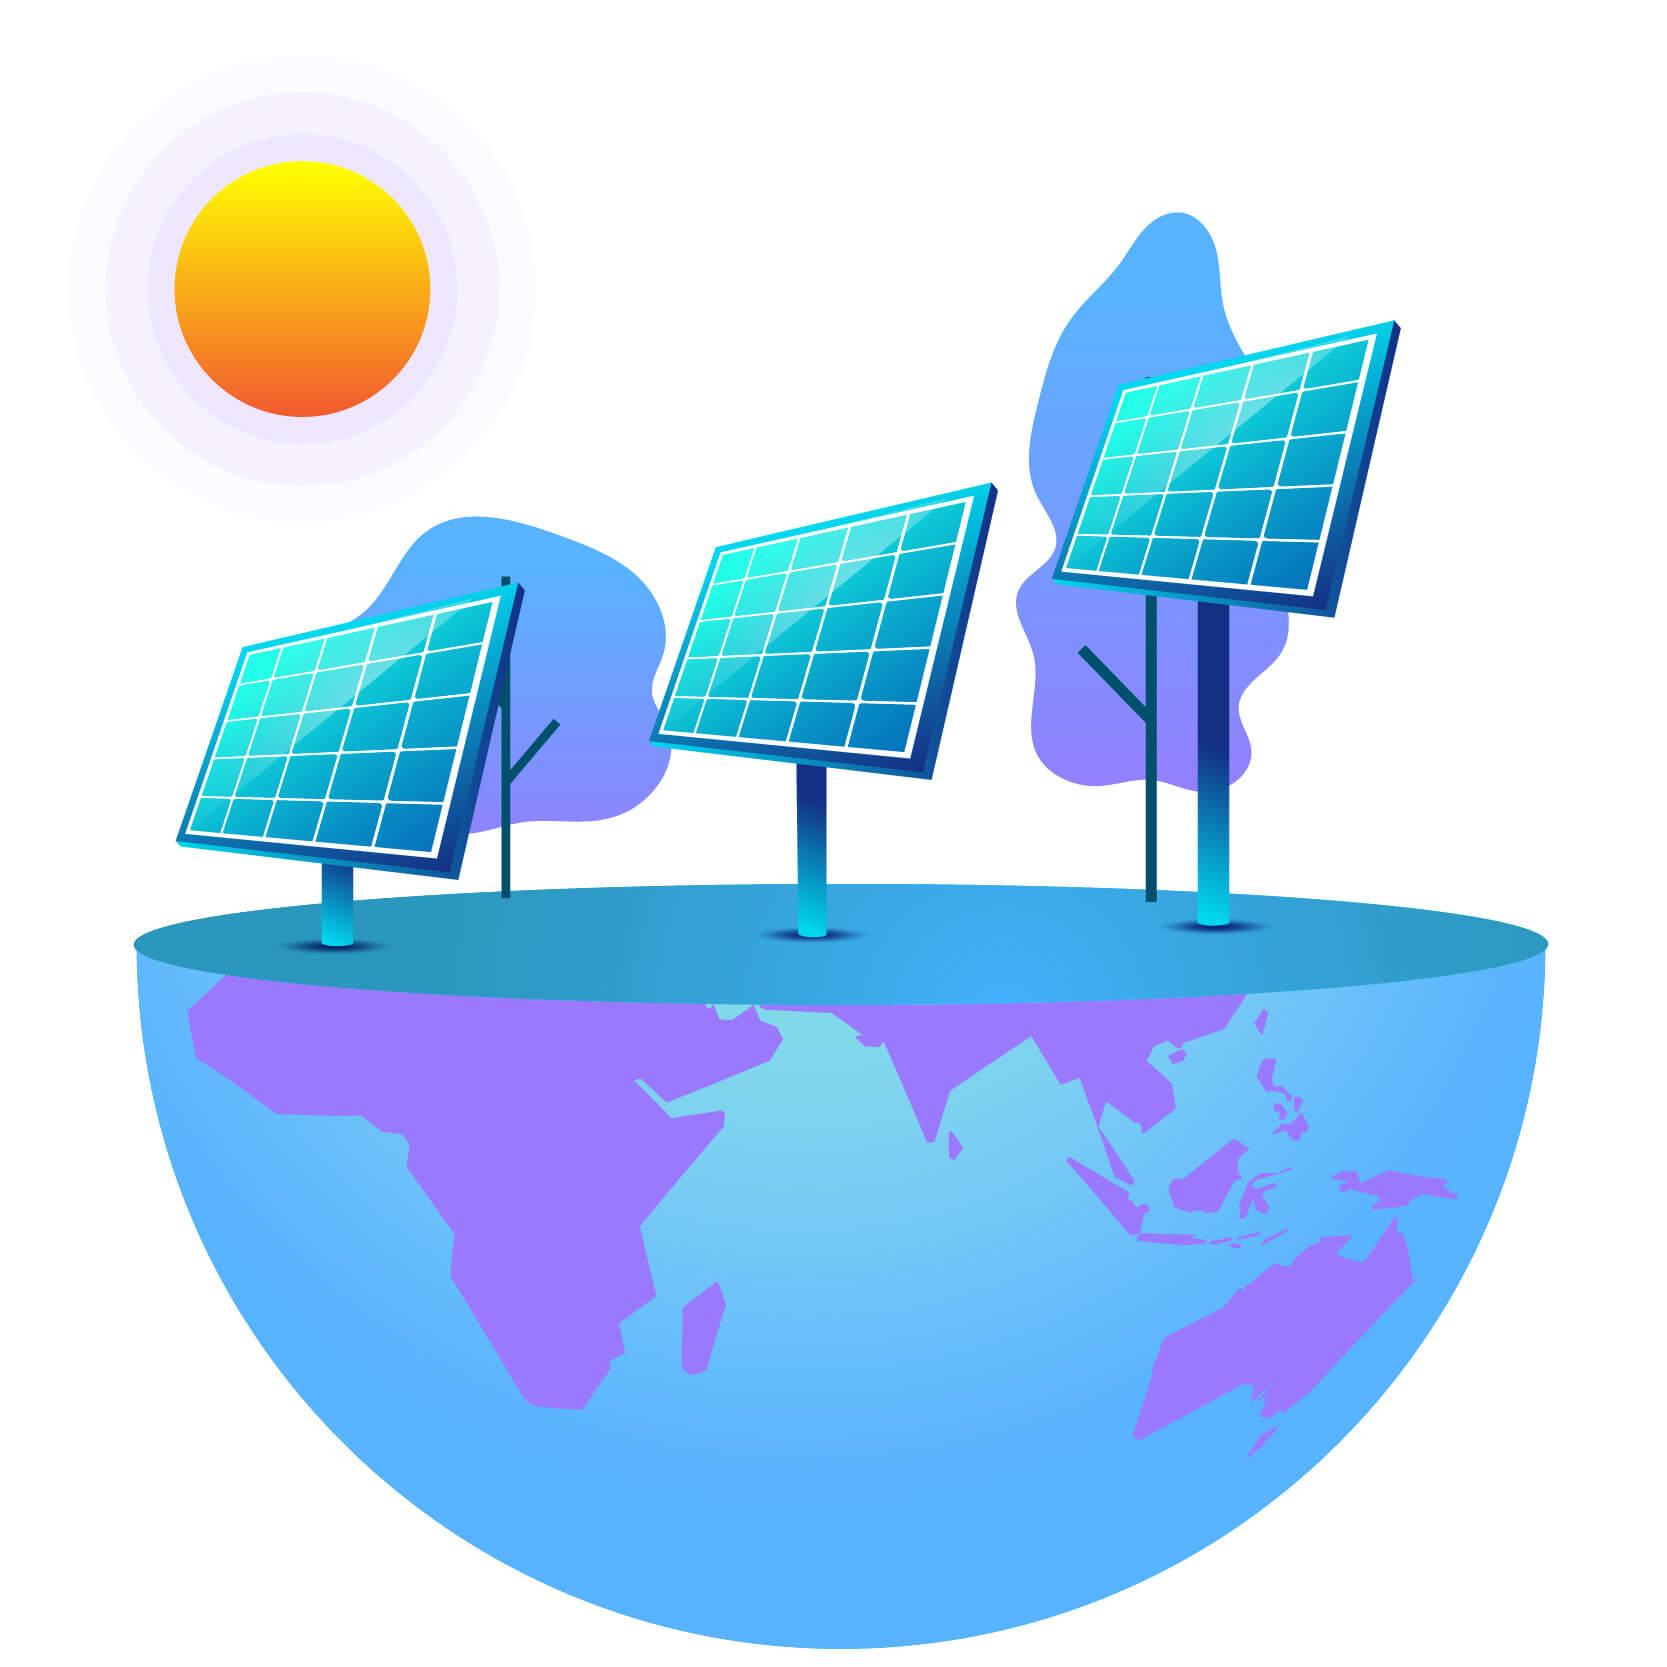 altura_paneles_solares